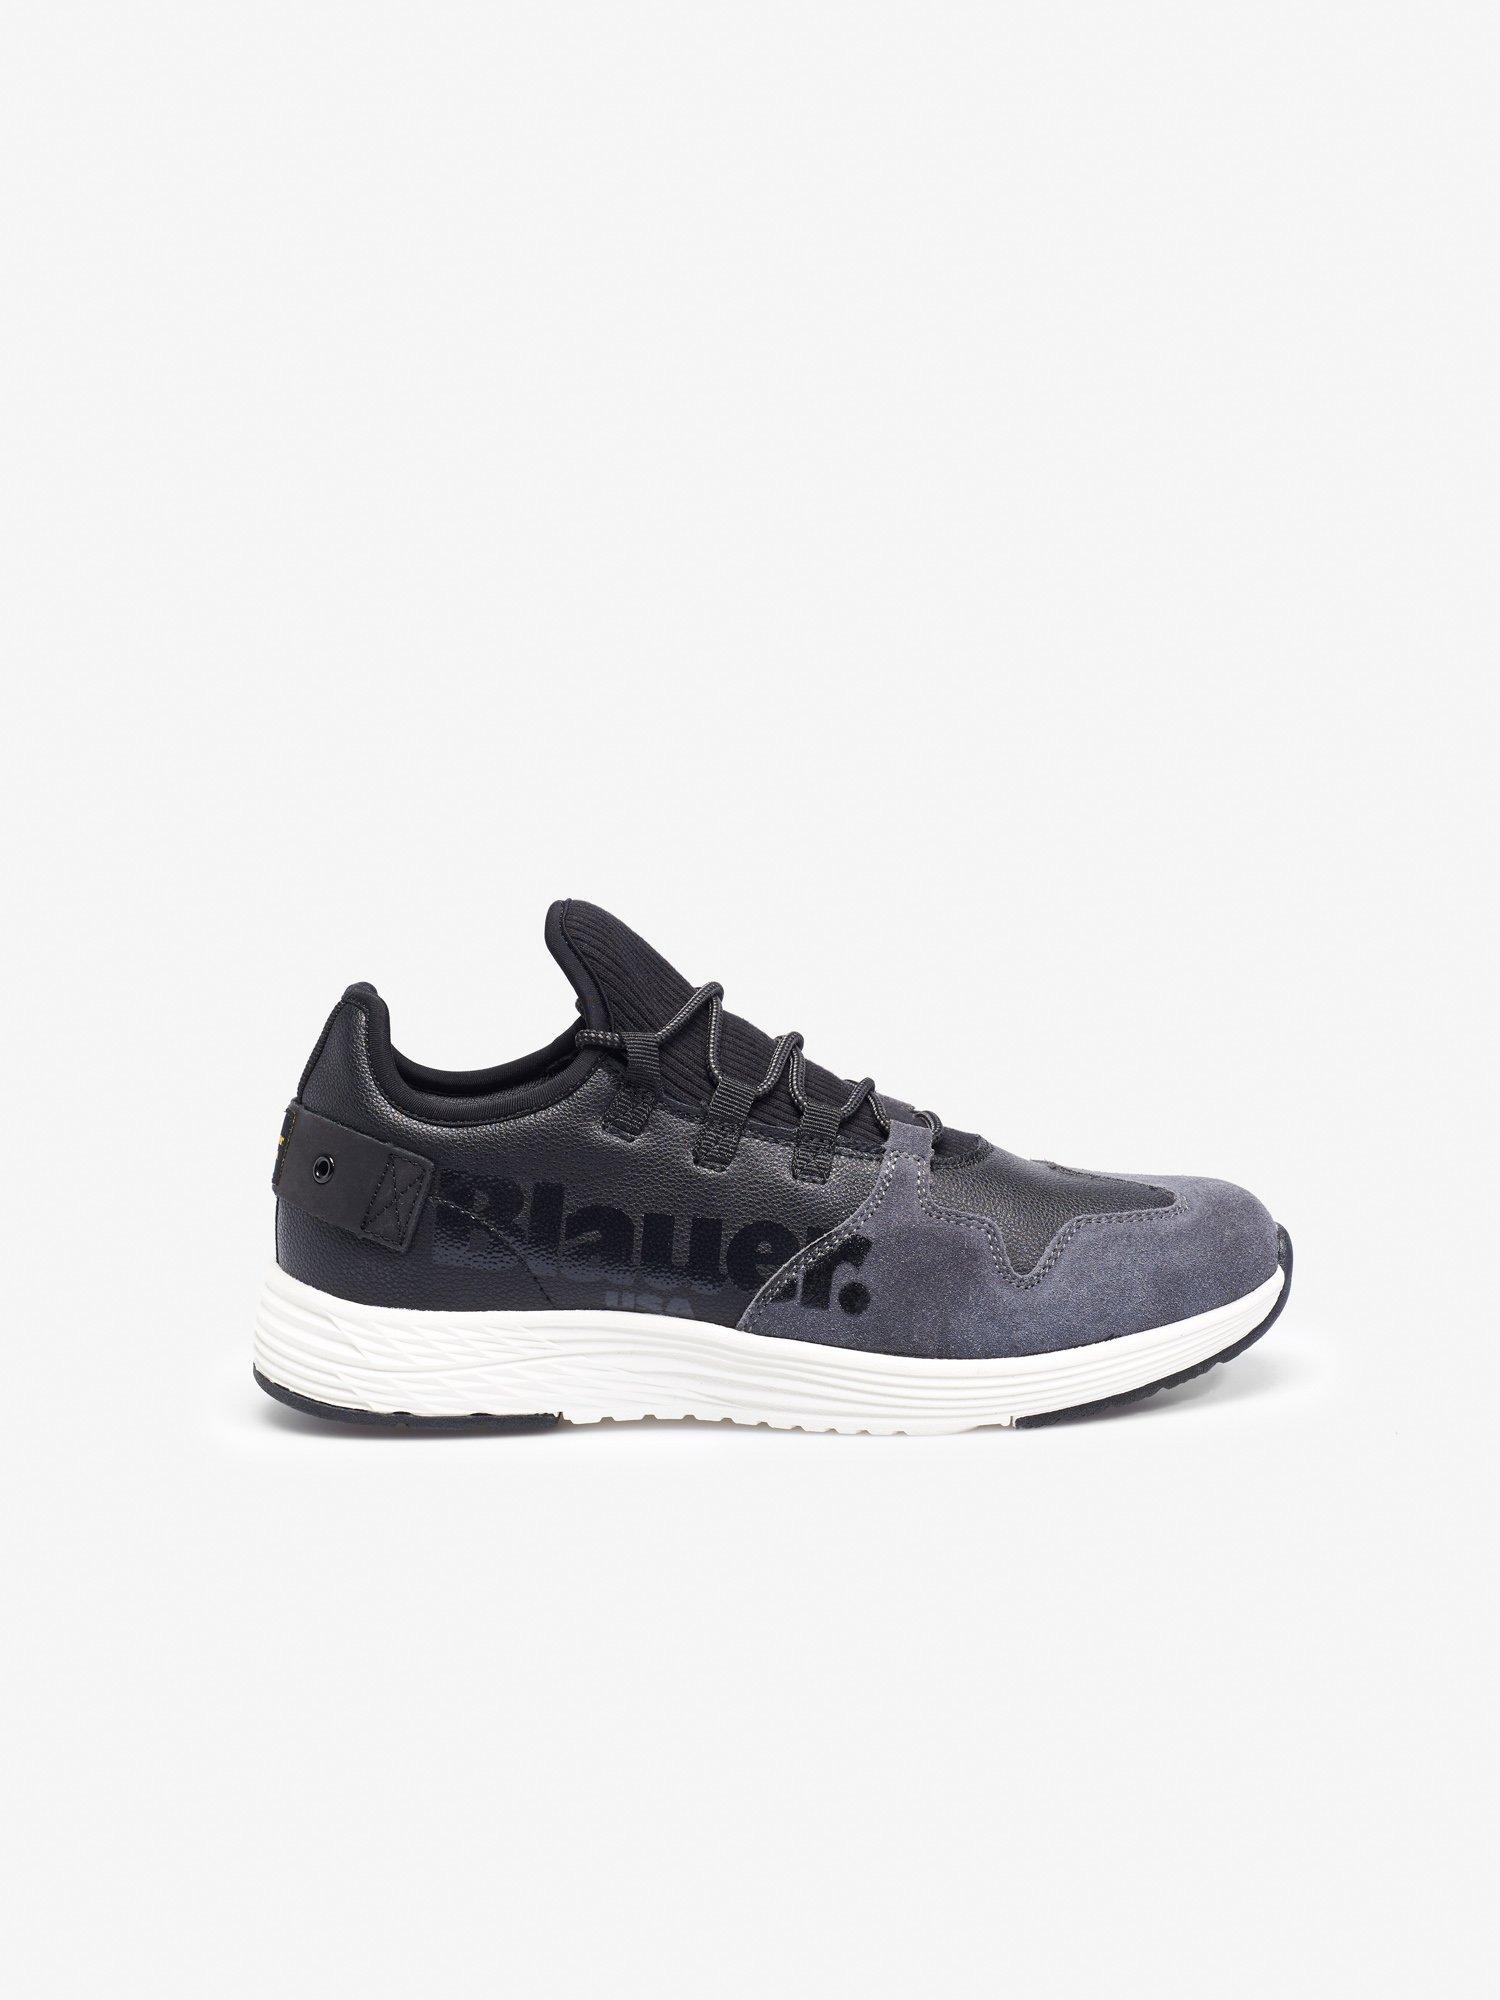 Saldi su Scarpe e Sneakeres Uomo Blauer - Shop Online  a1858609fc3